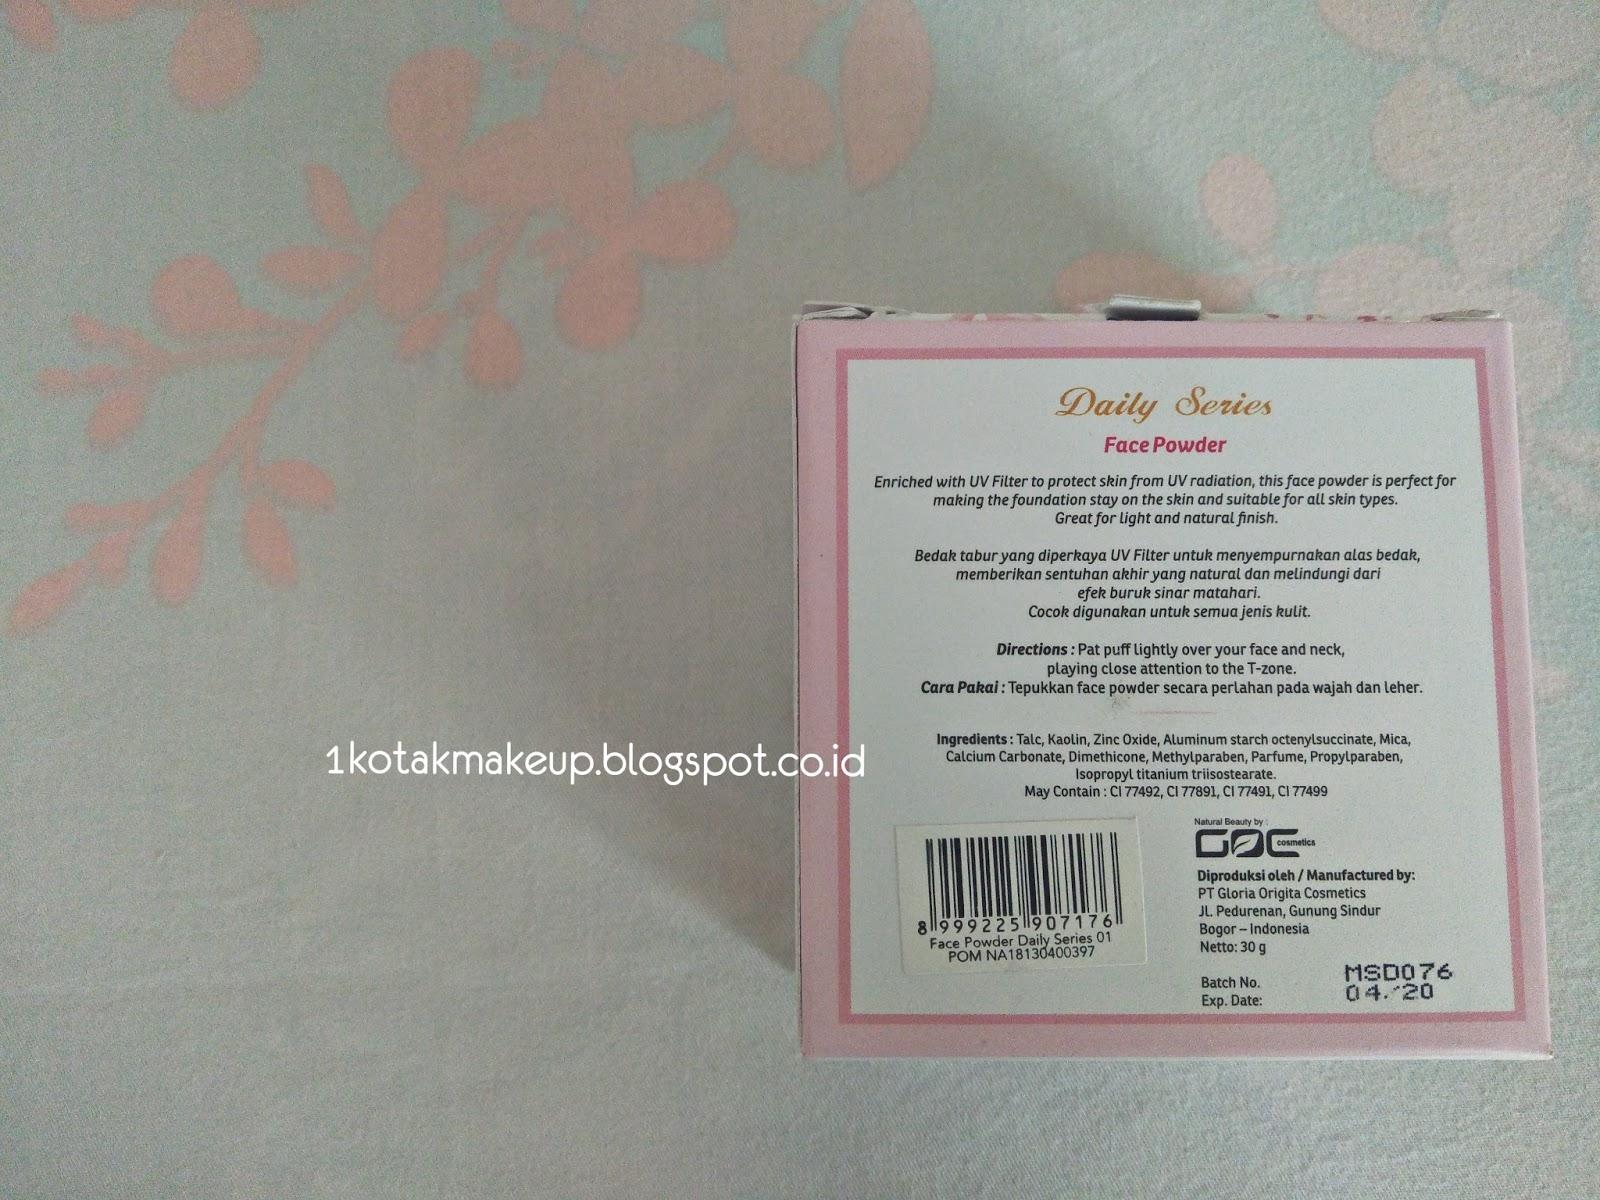 Purbasari Face Powder Daily Series 01 Natural 30gr Daftar Harga Foundation Tac Tampilan Belakang Kotak